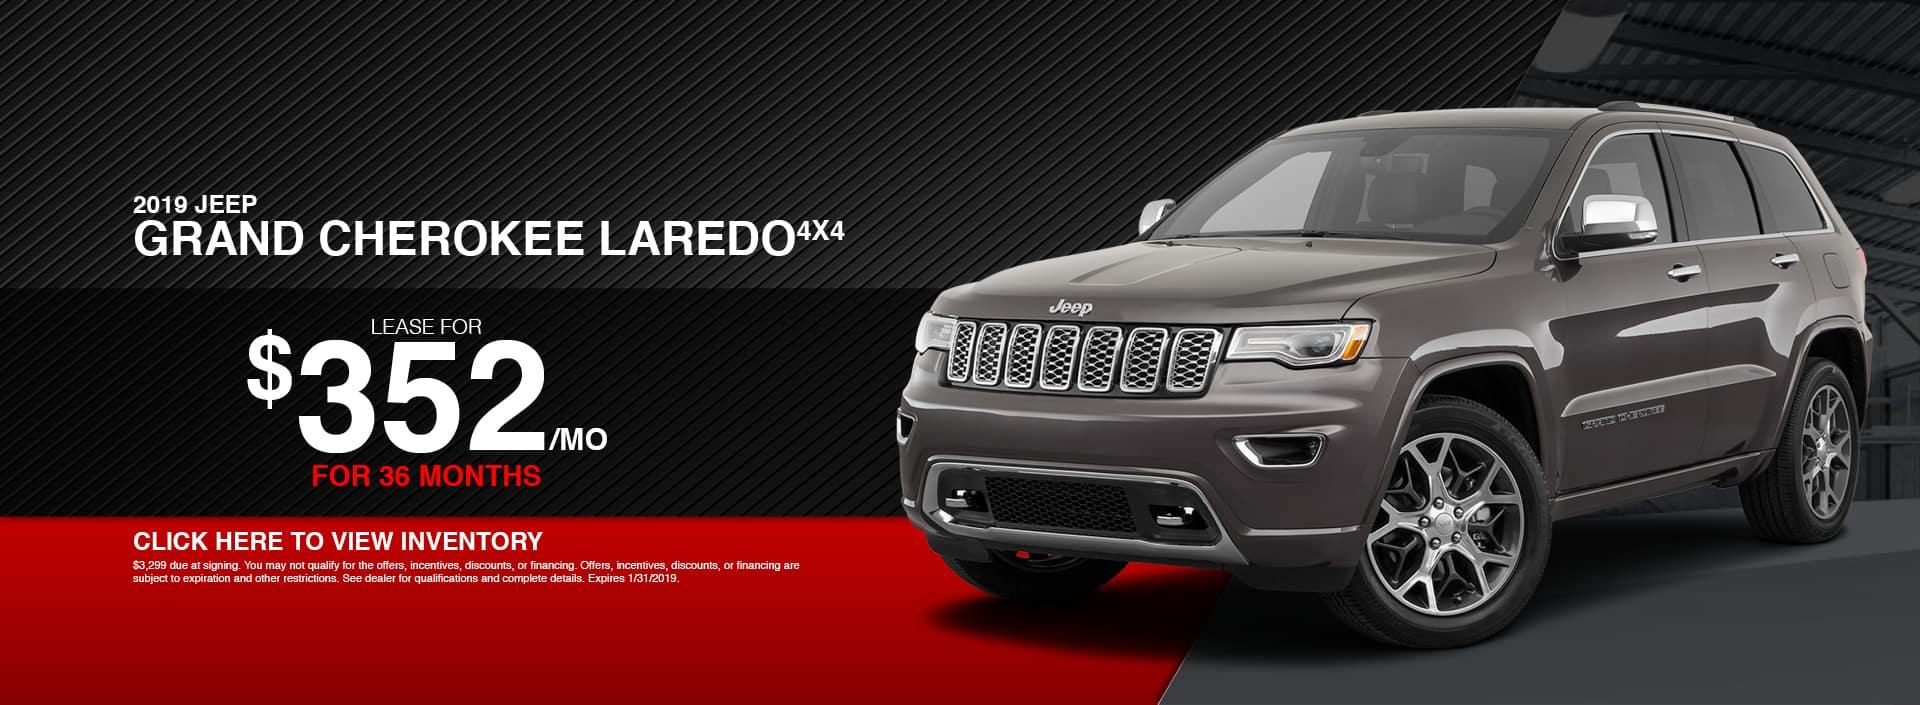 2019 Jeep Grand Cherokee Laredo Special in Waseca, MN